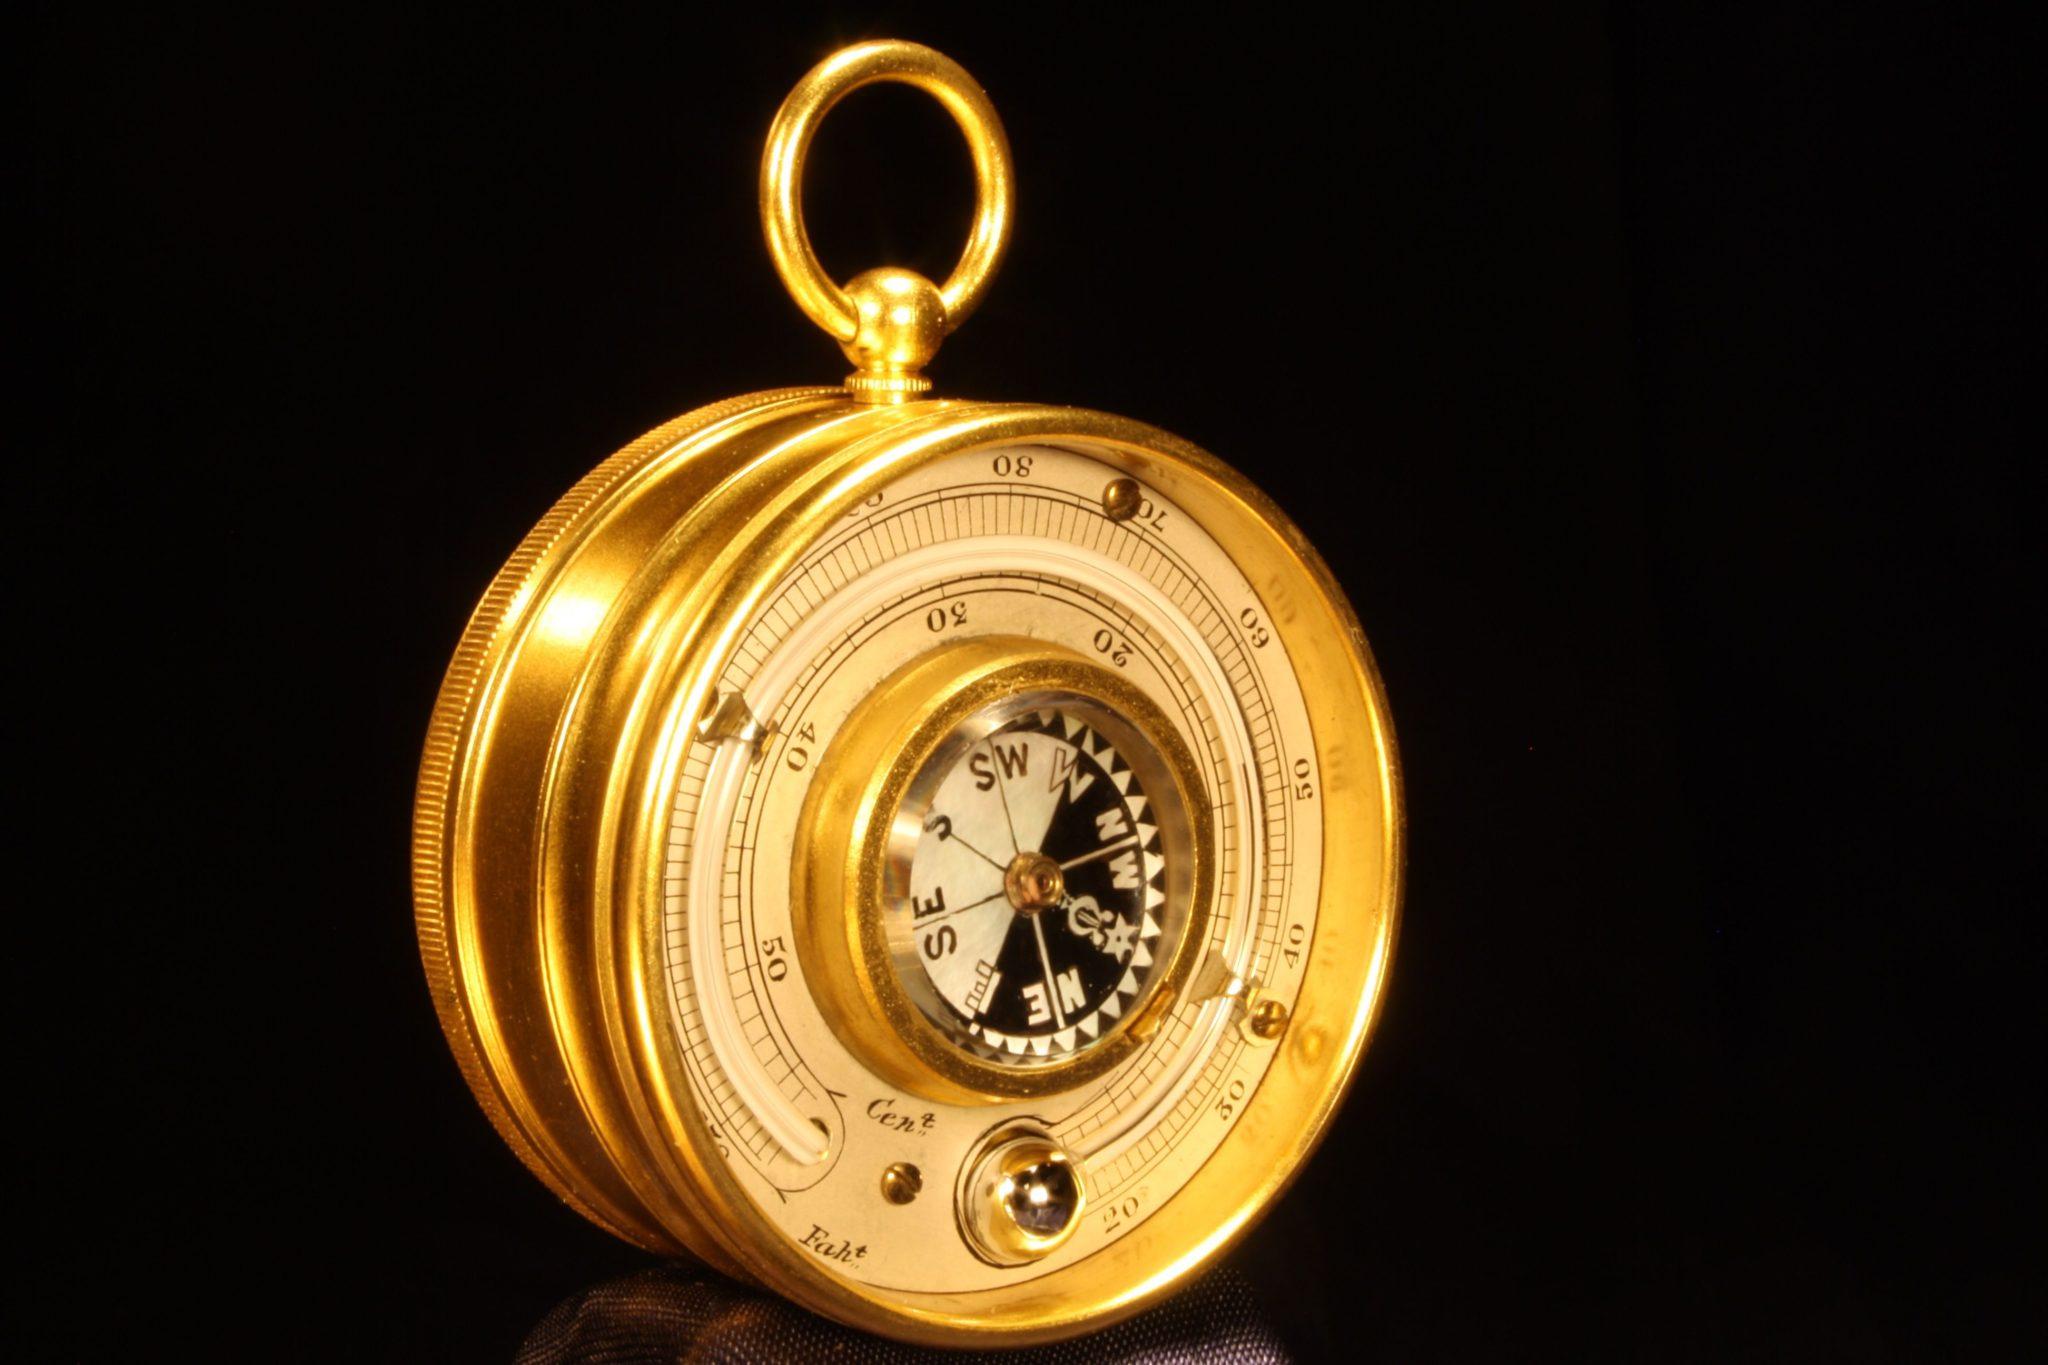 Image of Negretti & Zambra Pocket Barometer Compendium c1895